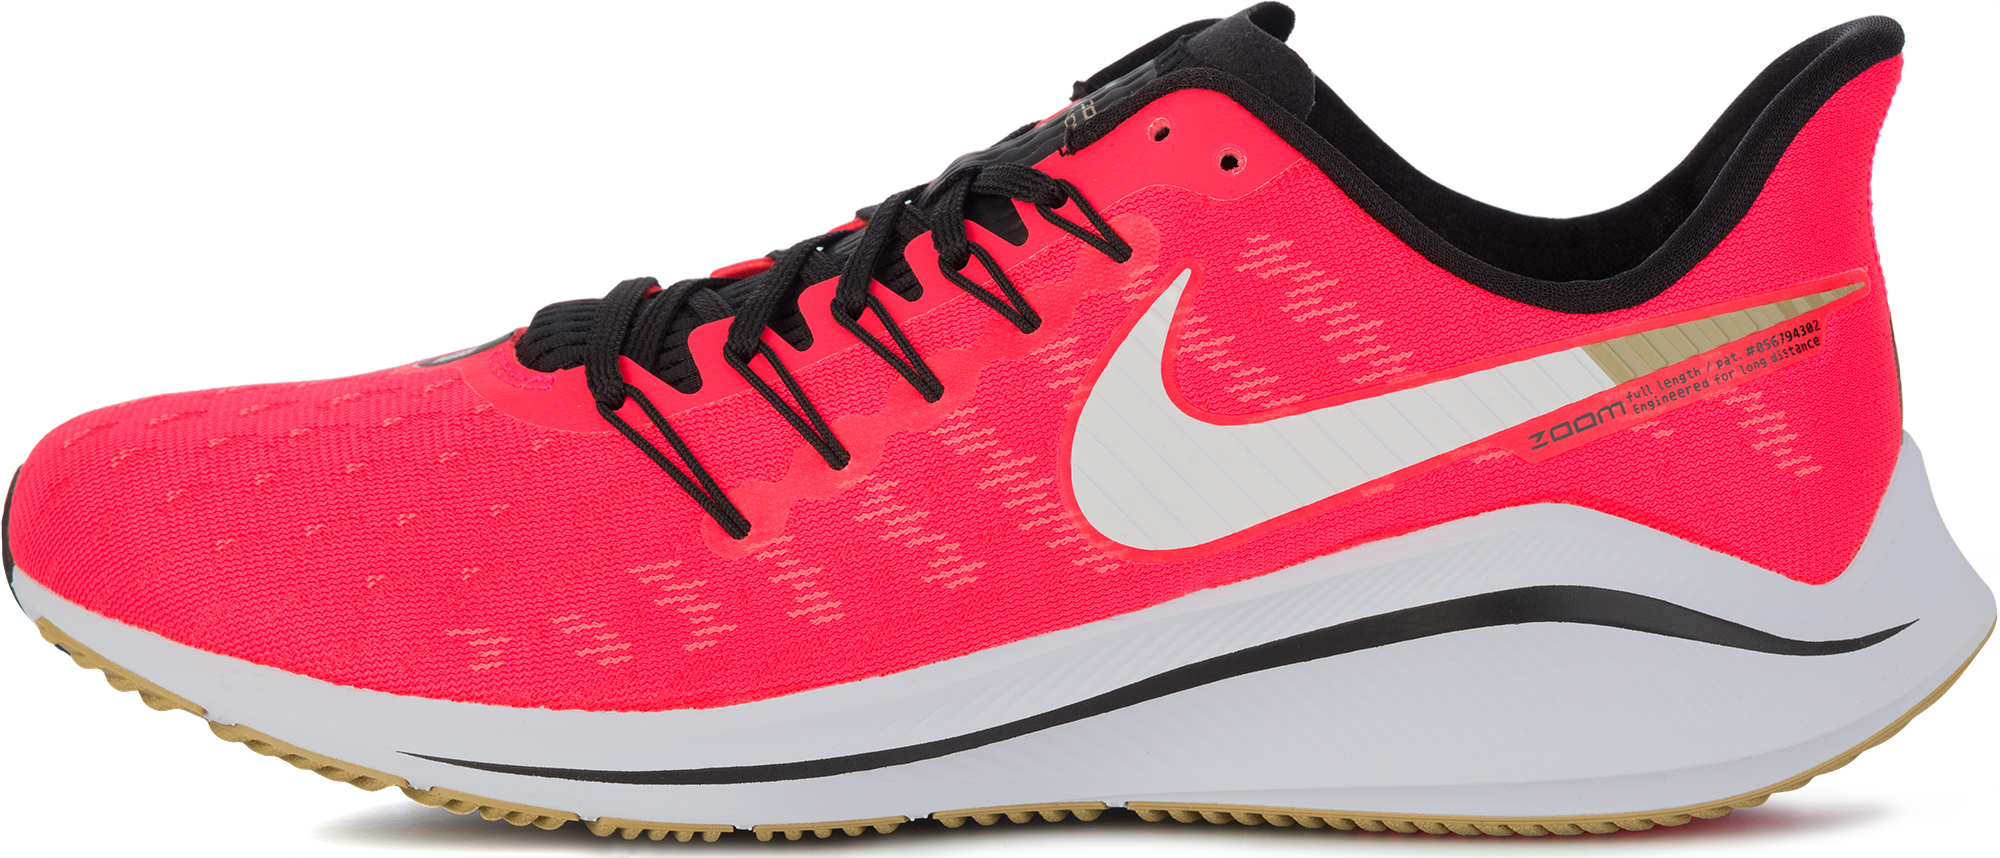 Nike Кроссовки мужские Nike Air Zoom Vomero 14, размер 44 nike боксерки мужские nike machomai размер 44